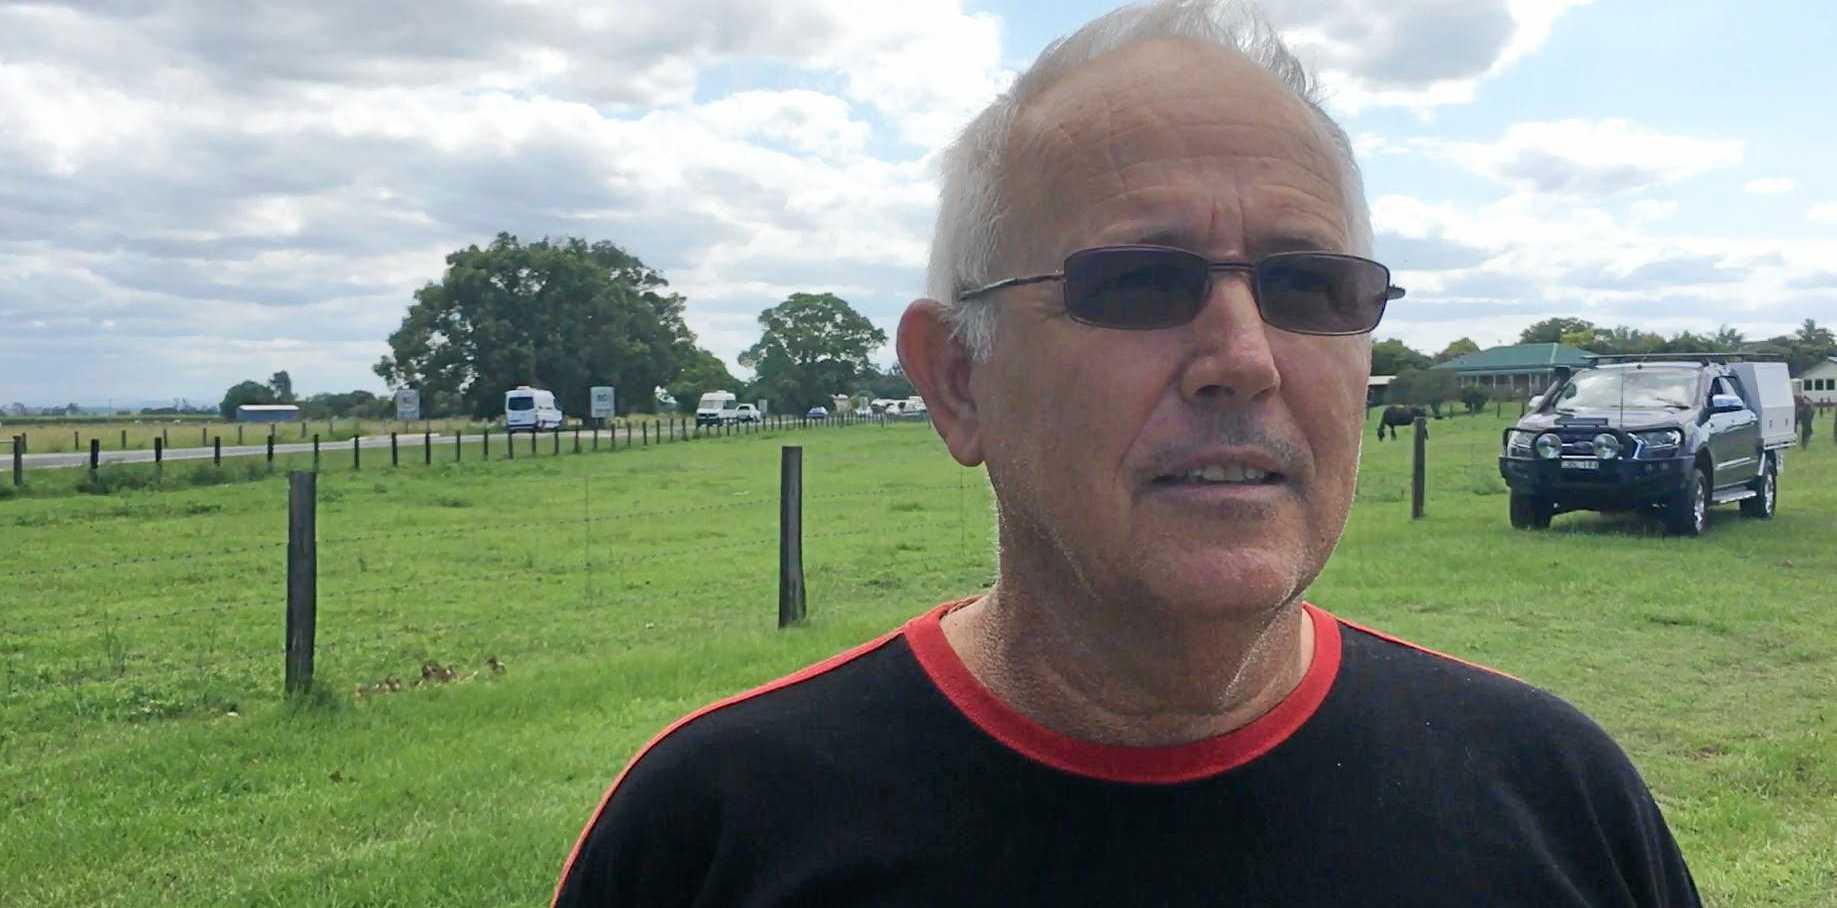 Ulmarra resident John Leask just wants his community to feel safe.